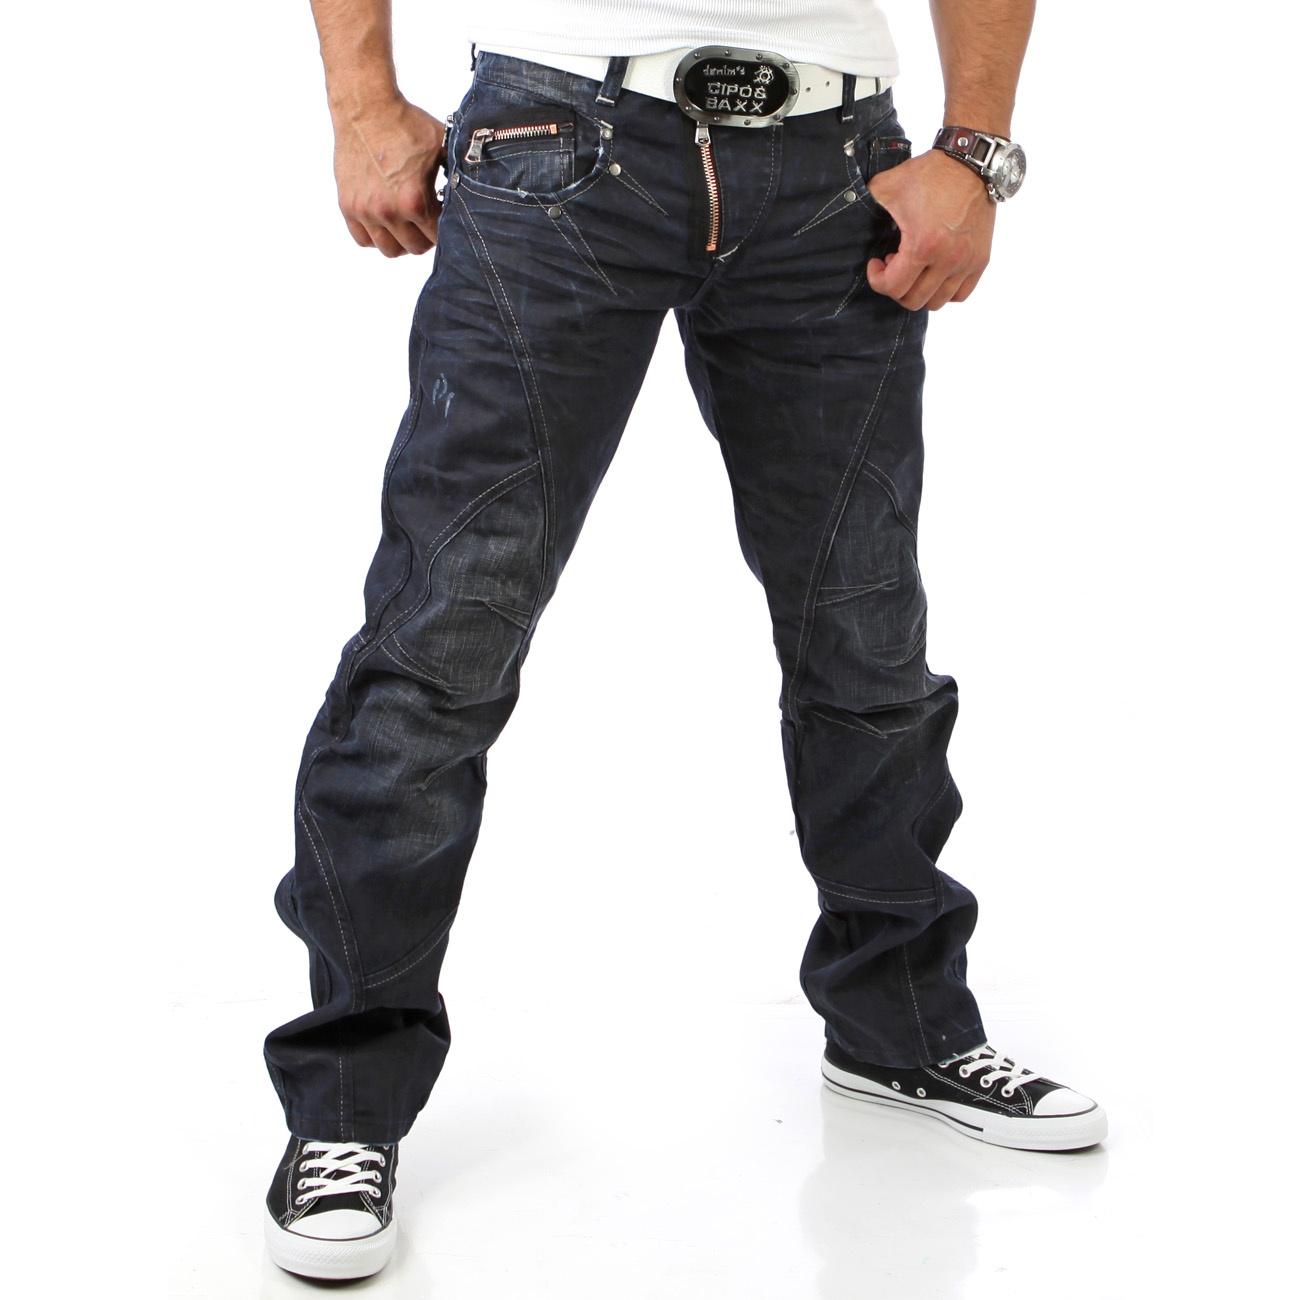 cipo baxx original denim herren jeanshose jeans hose zipper blau c 645 d blau ebay. Black Bedroom Furniture Sets. Home Design Ideas